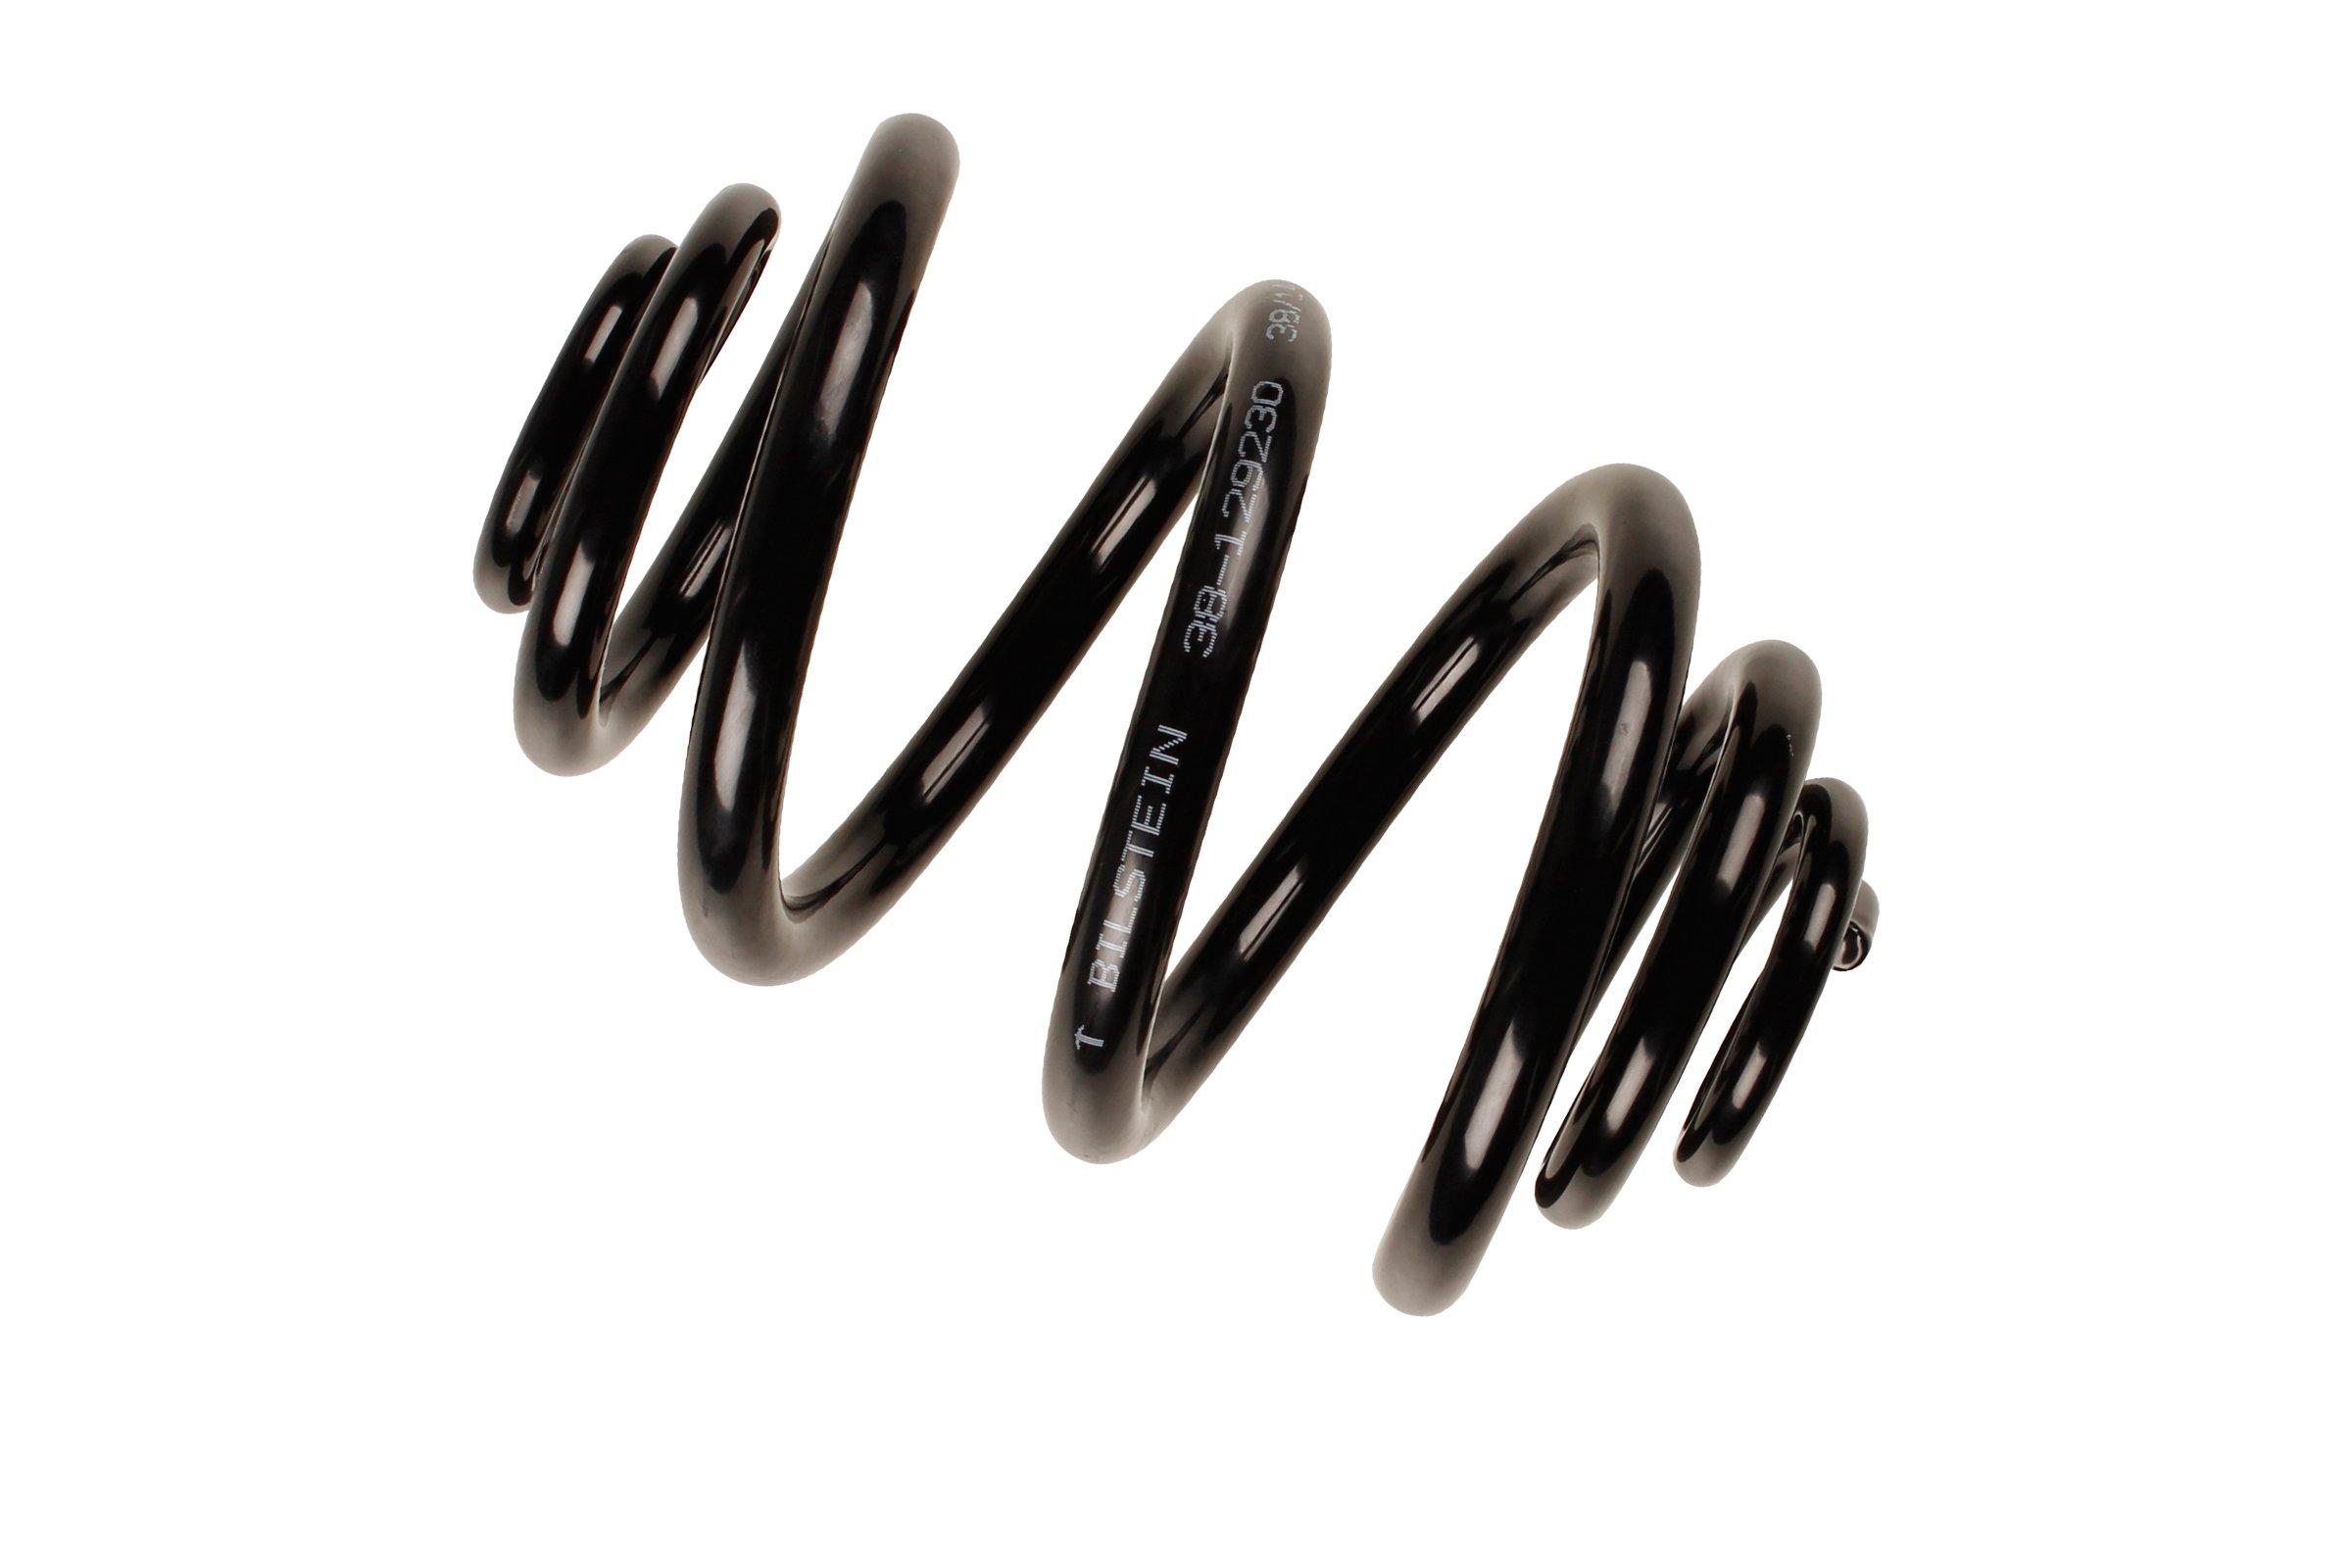 Bilstein 38-129230 Coil Spring (B3 98-06 BMW 3 Series Replacement Rear)